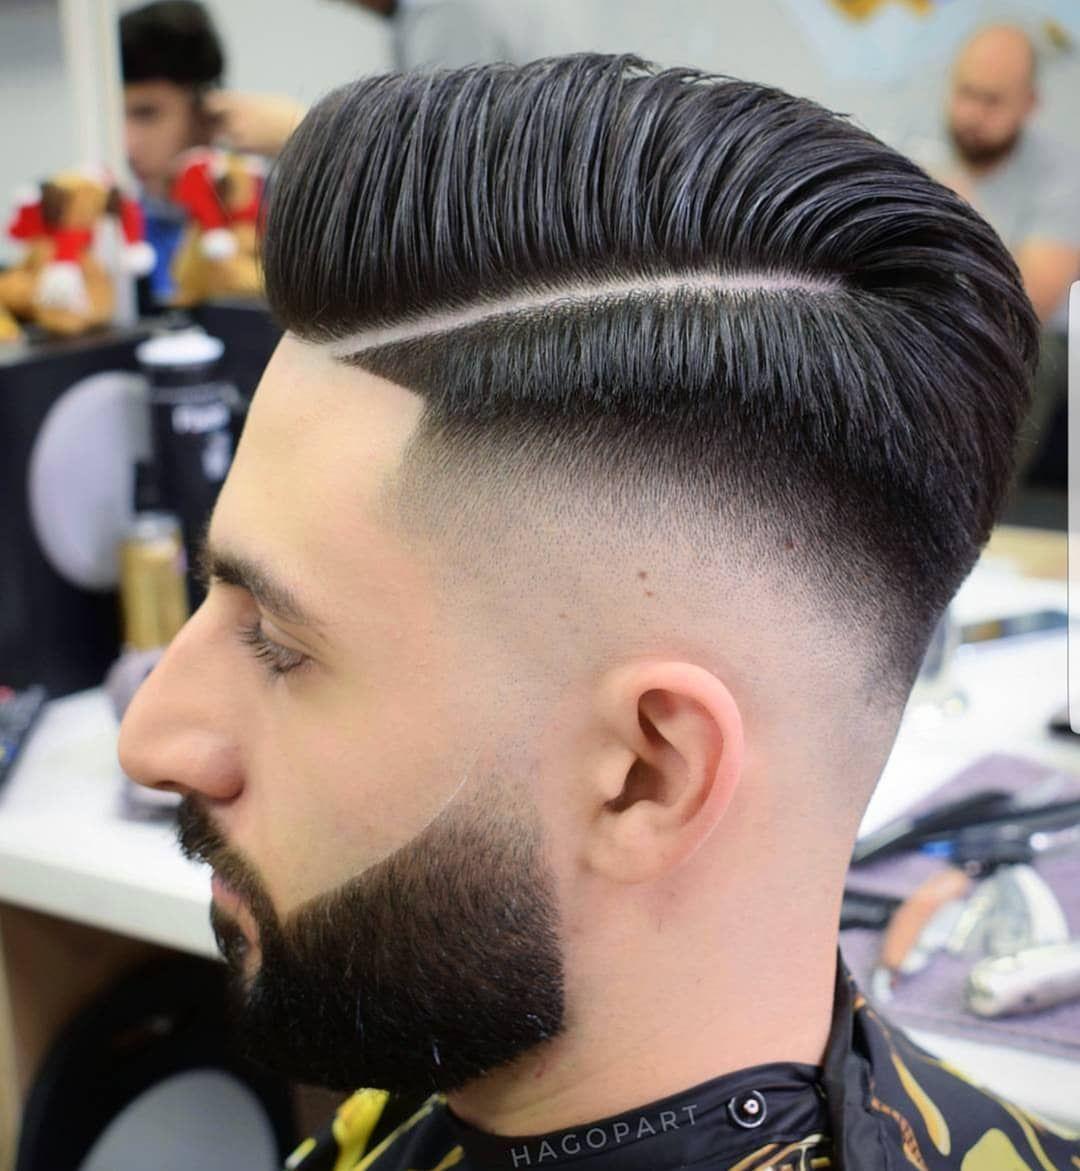 Ảnh: Pro Barber Tips